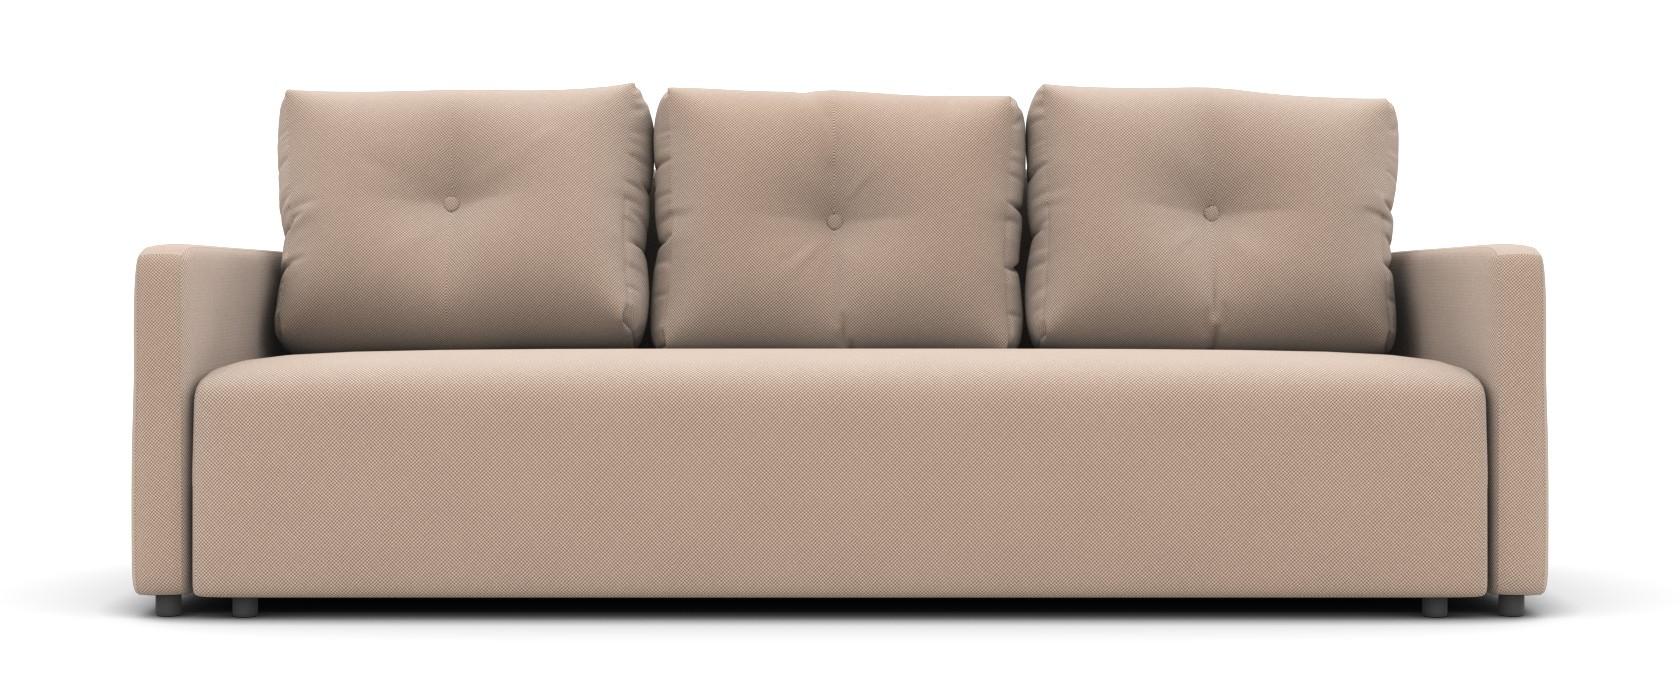 Трехместный диван Adriano - Pufetto